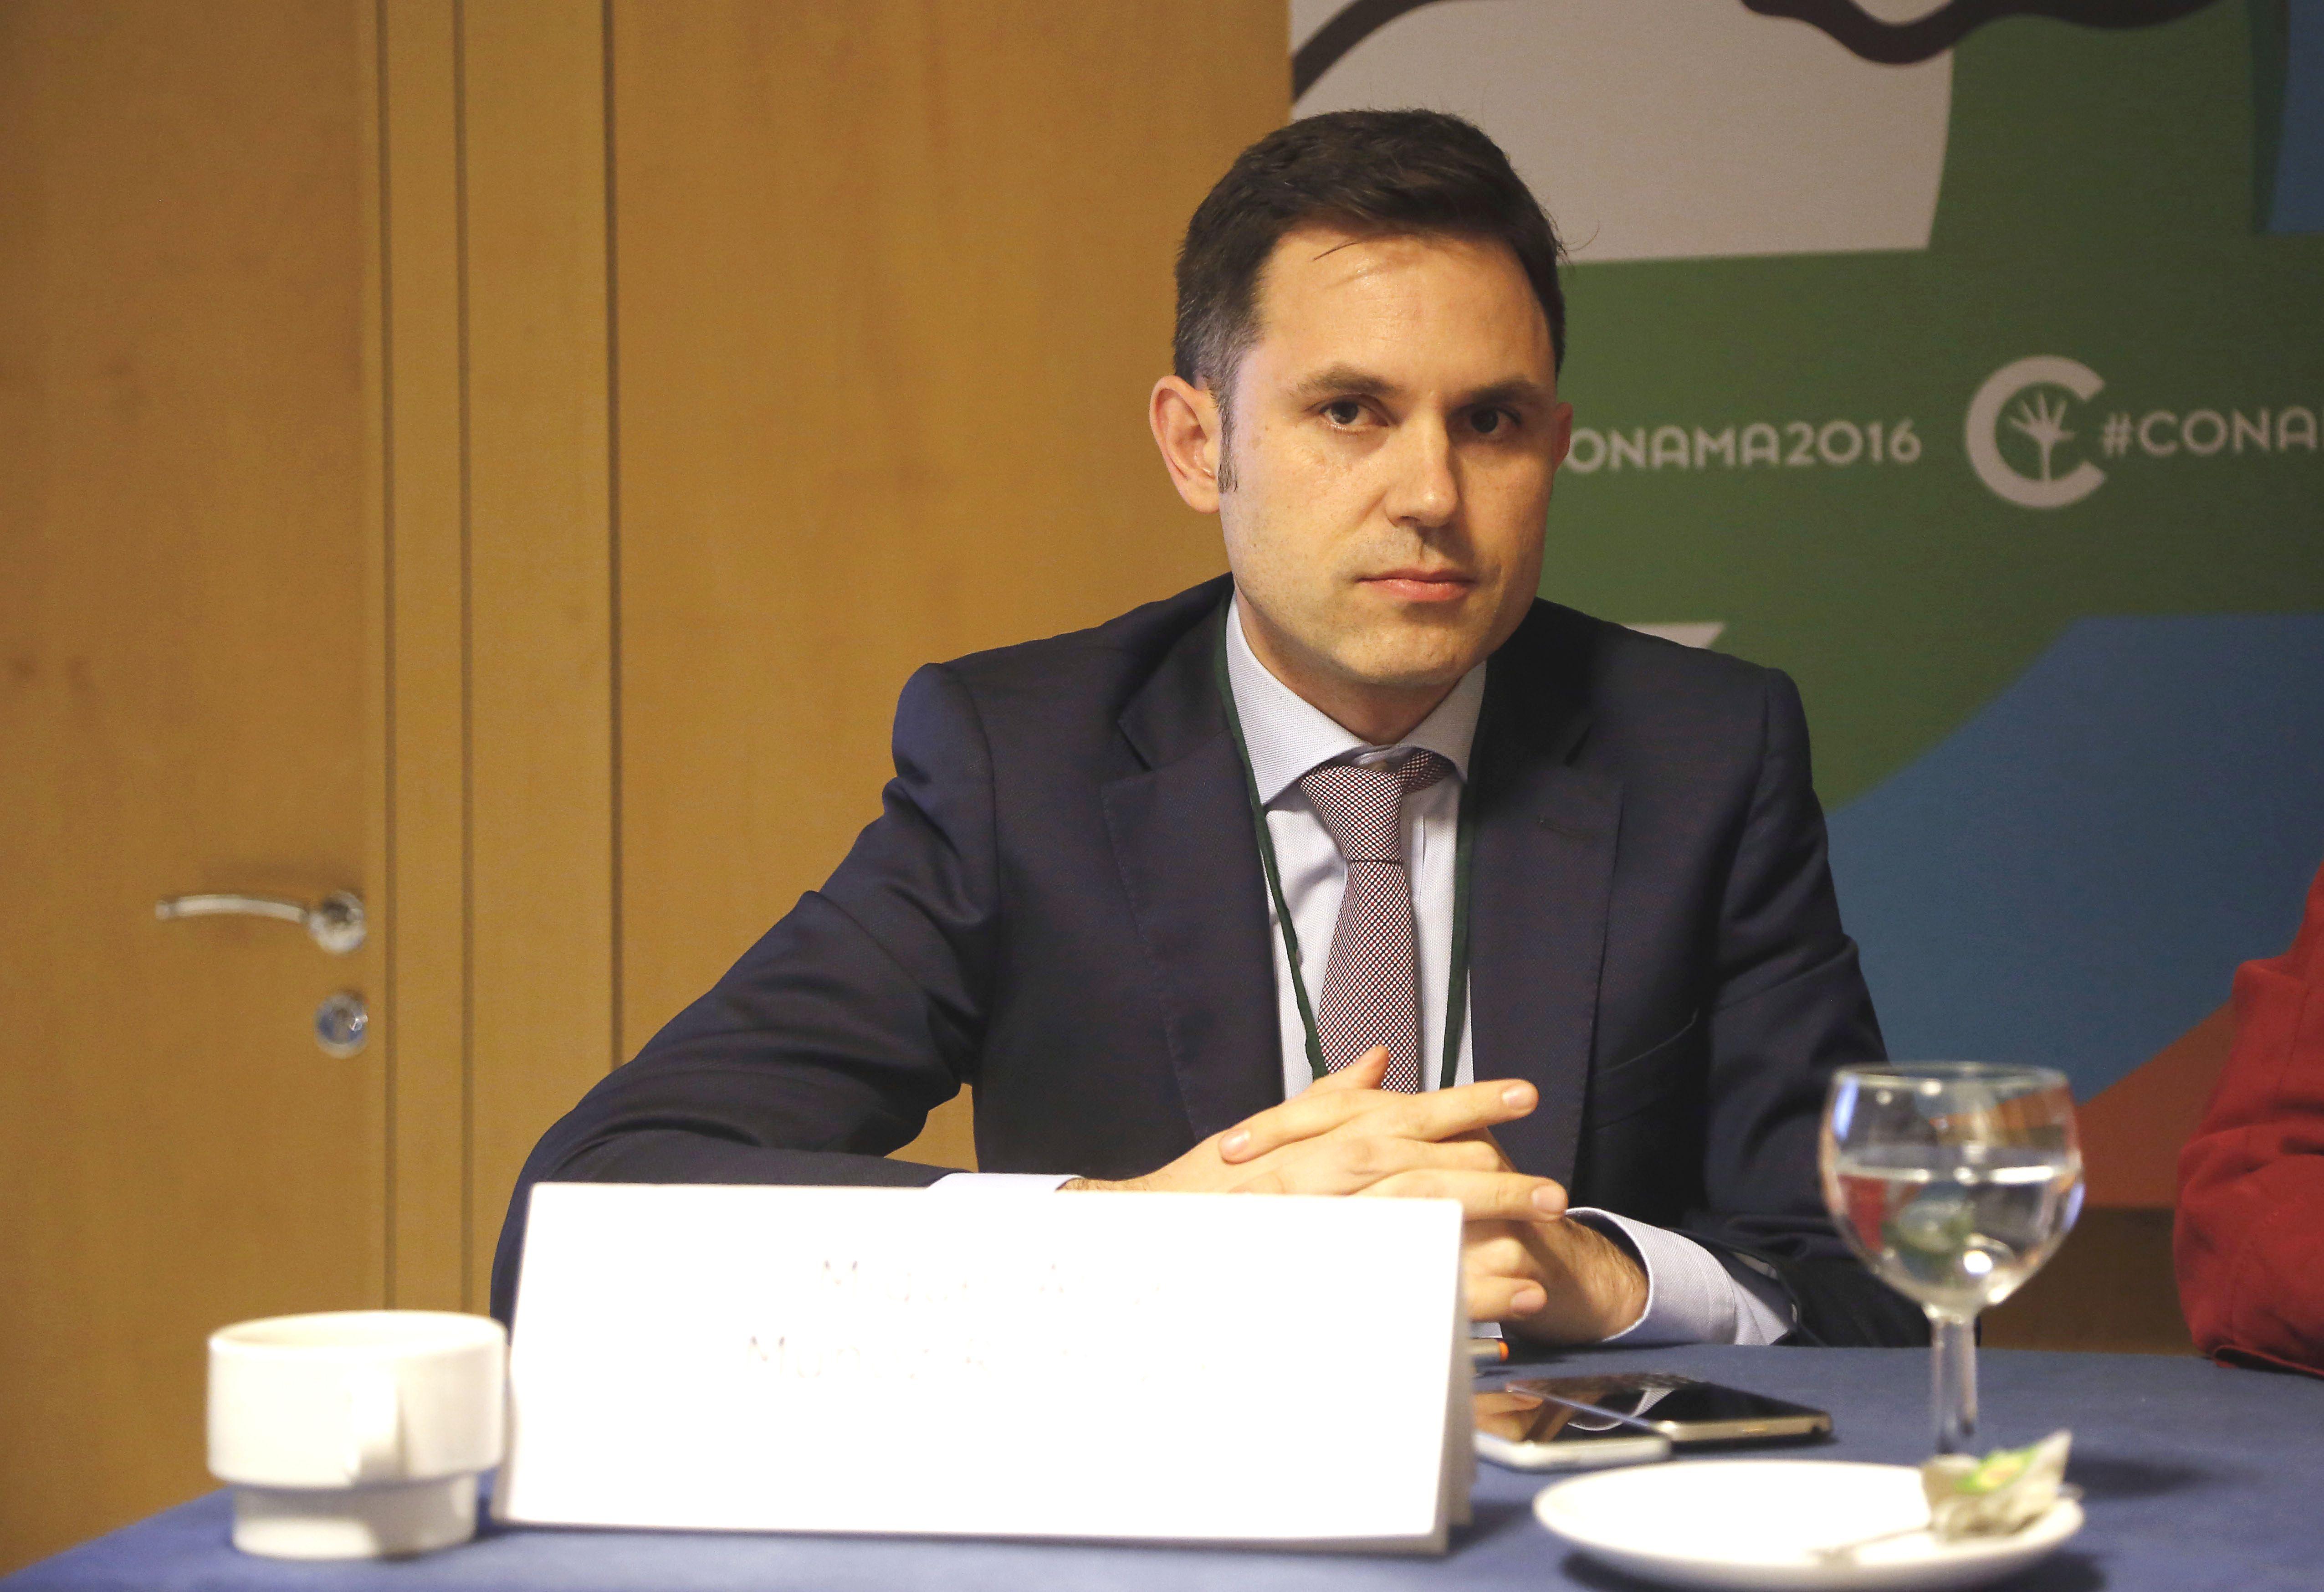 Miguel Ángel Muñoz Rodríguez (IBERDROLA)